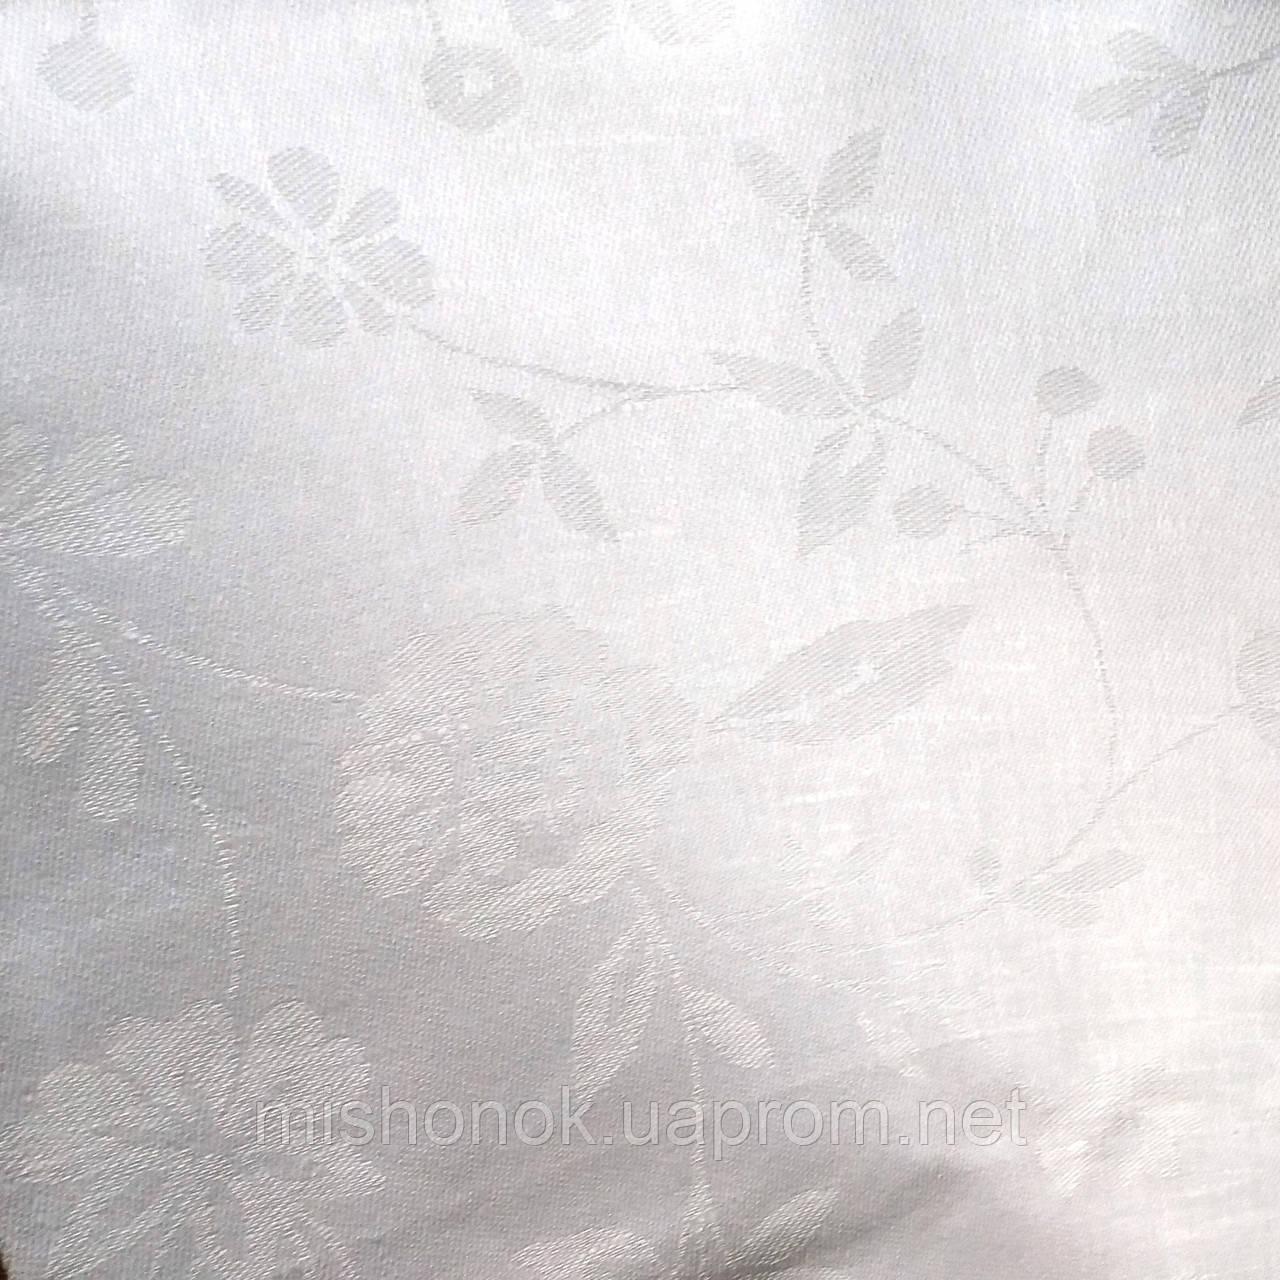 Ткань скатертная белая, лен, отрез 4м х 1,5м